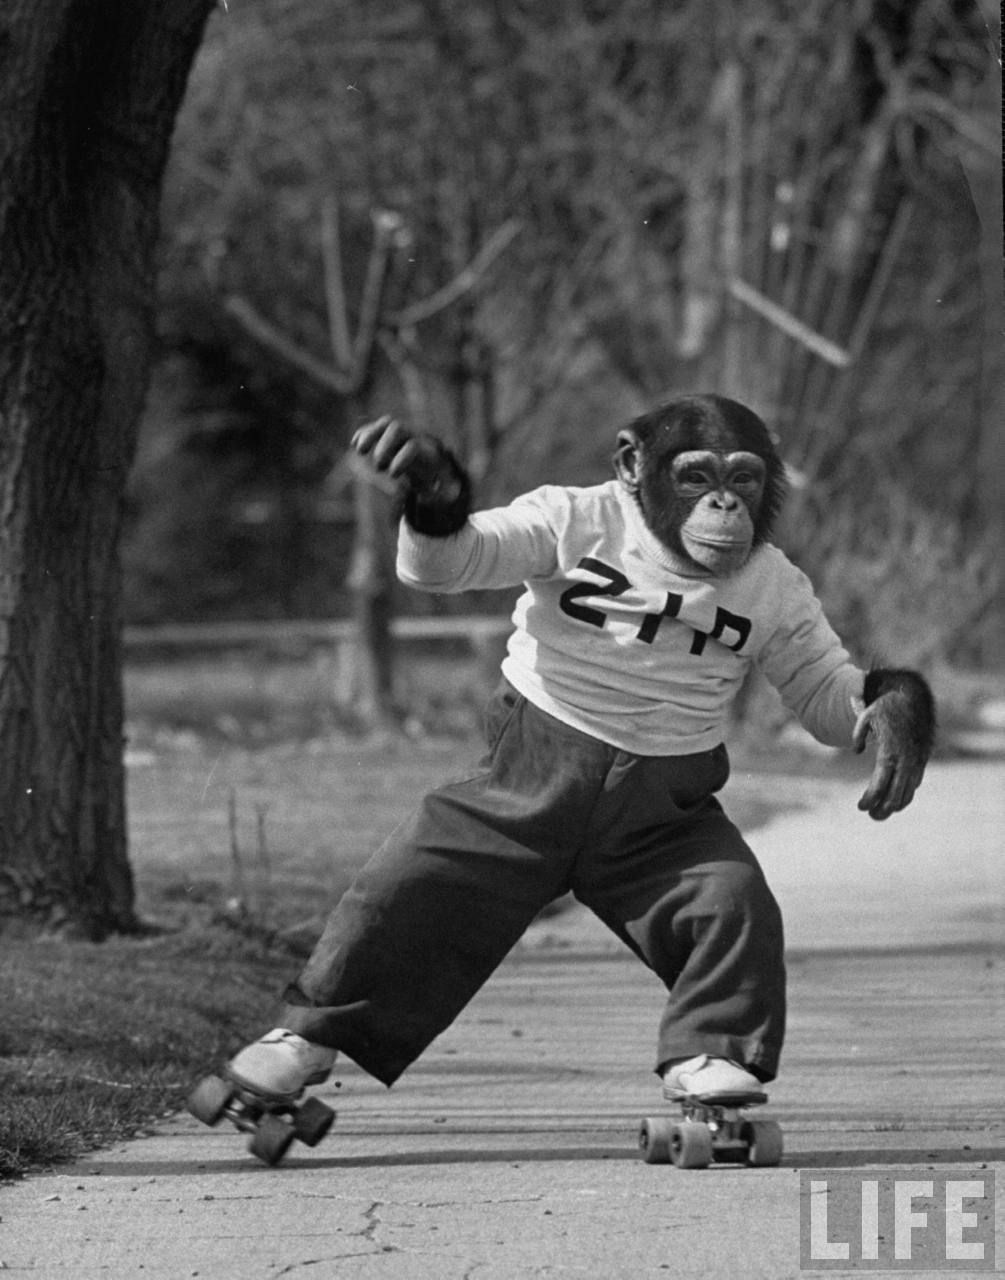 zippy the chimp roller skating